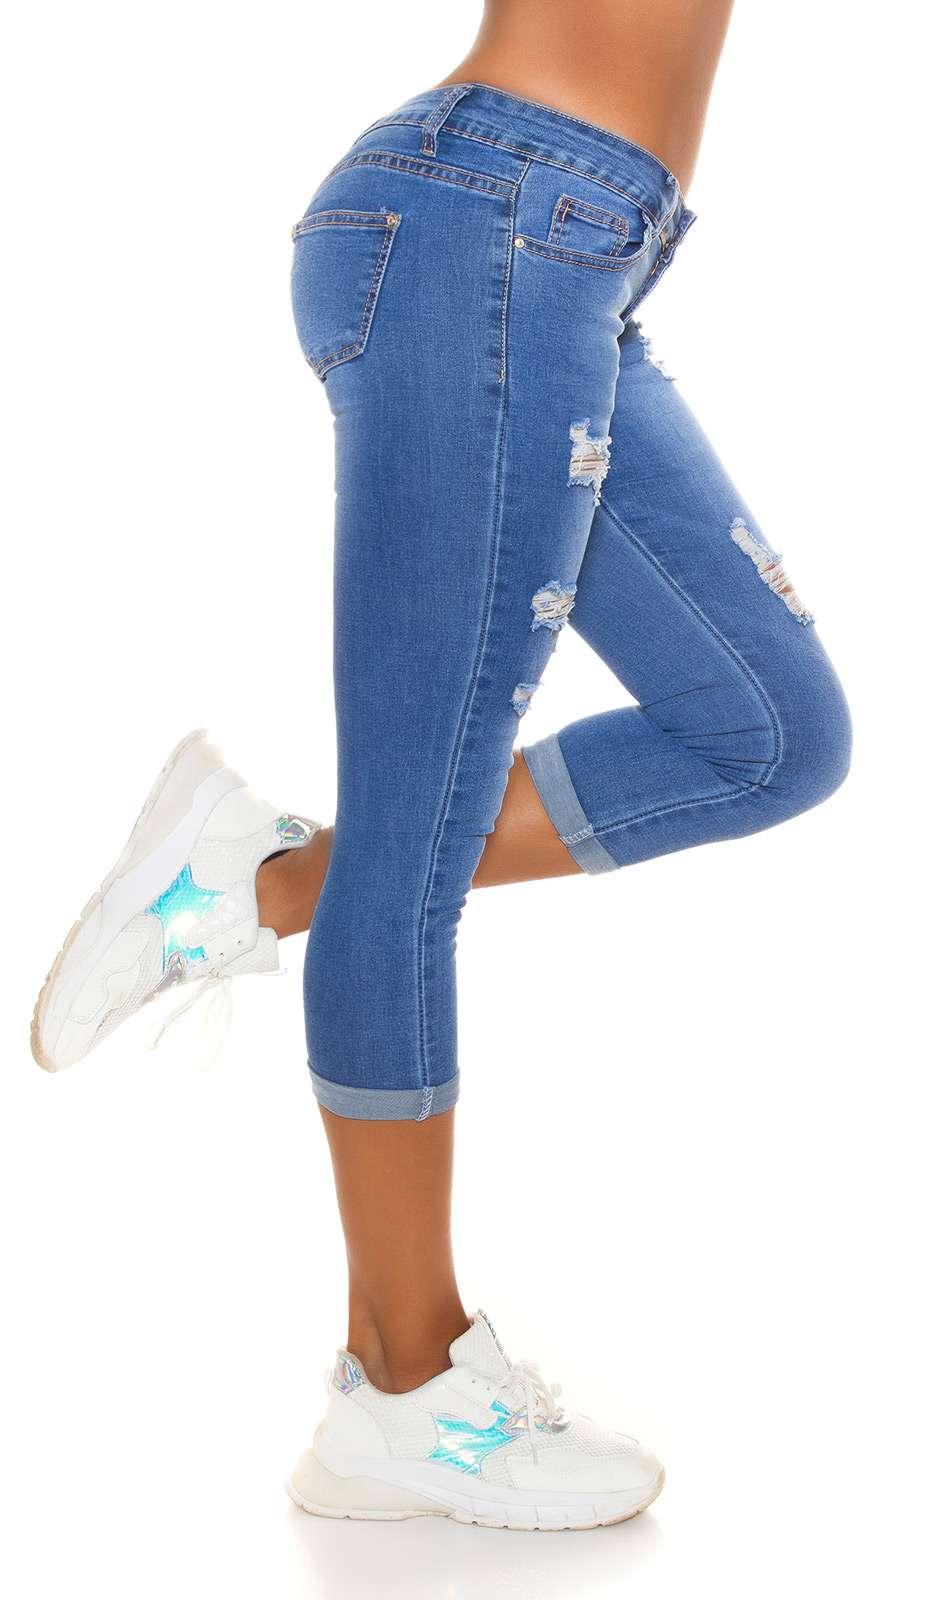 Low-Waist Jeans